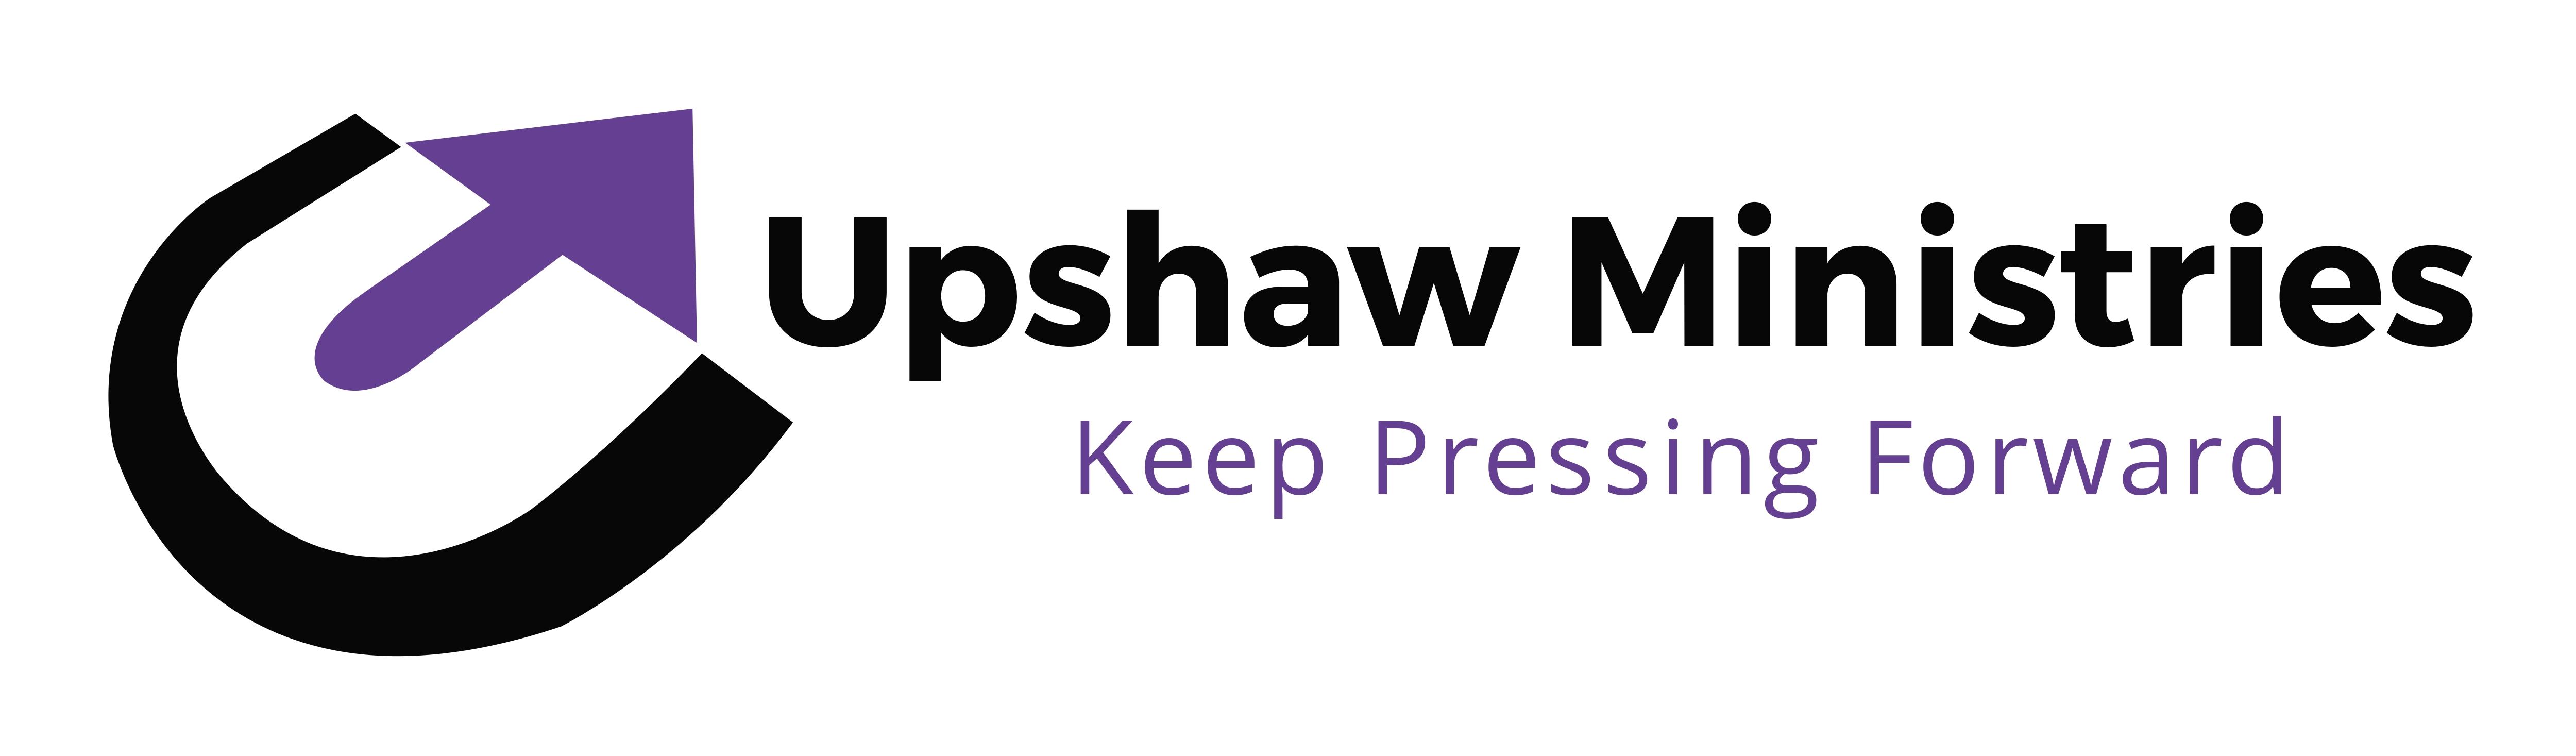 UPSHAW MINISTRIES